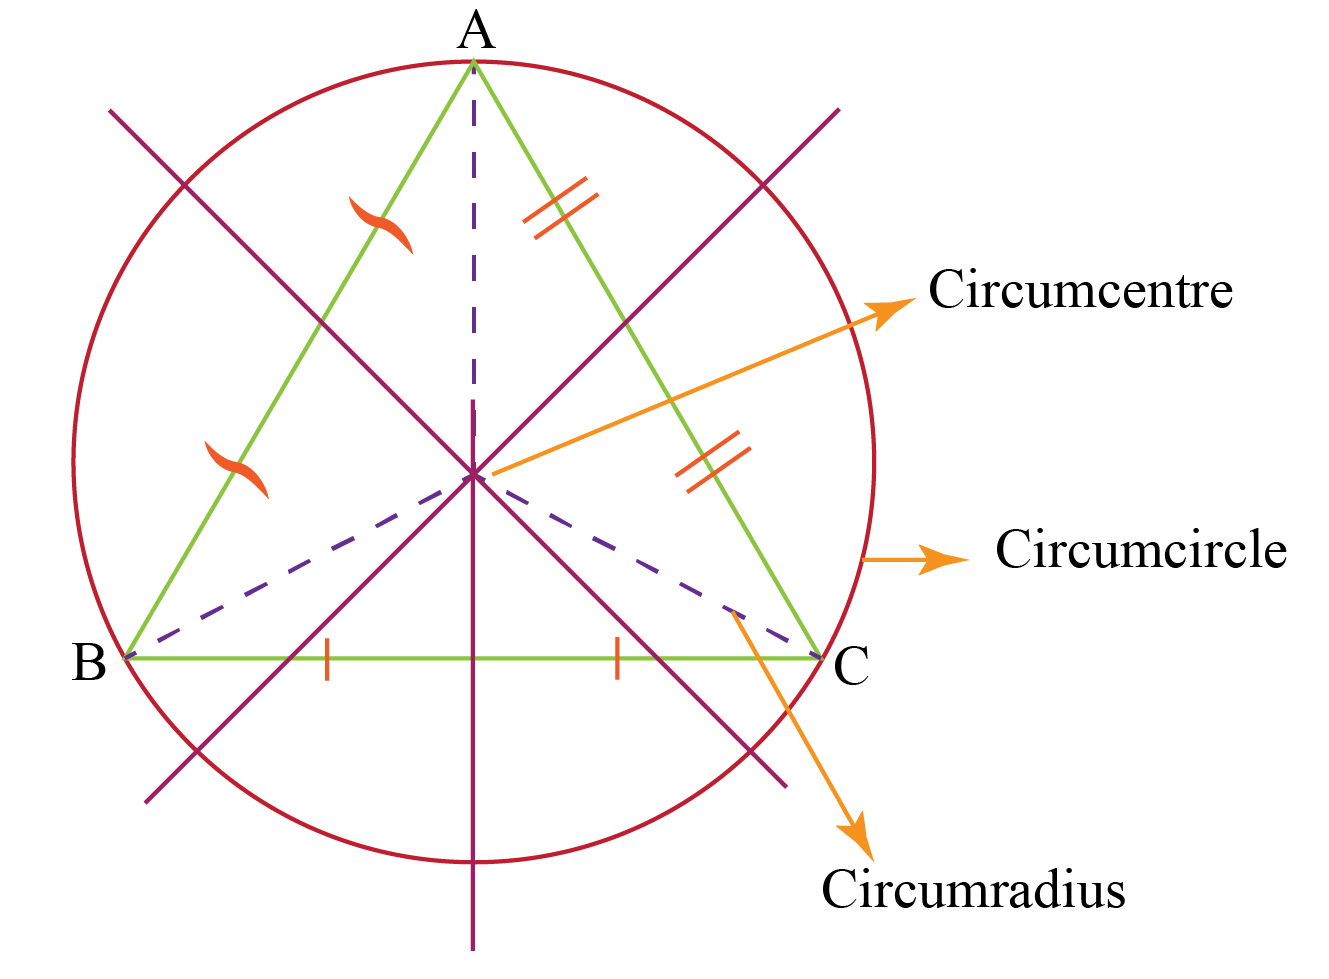 circumcircle of the triangle